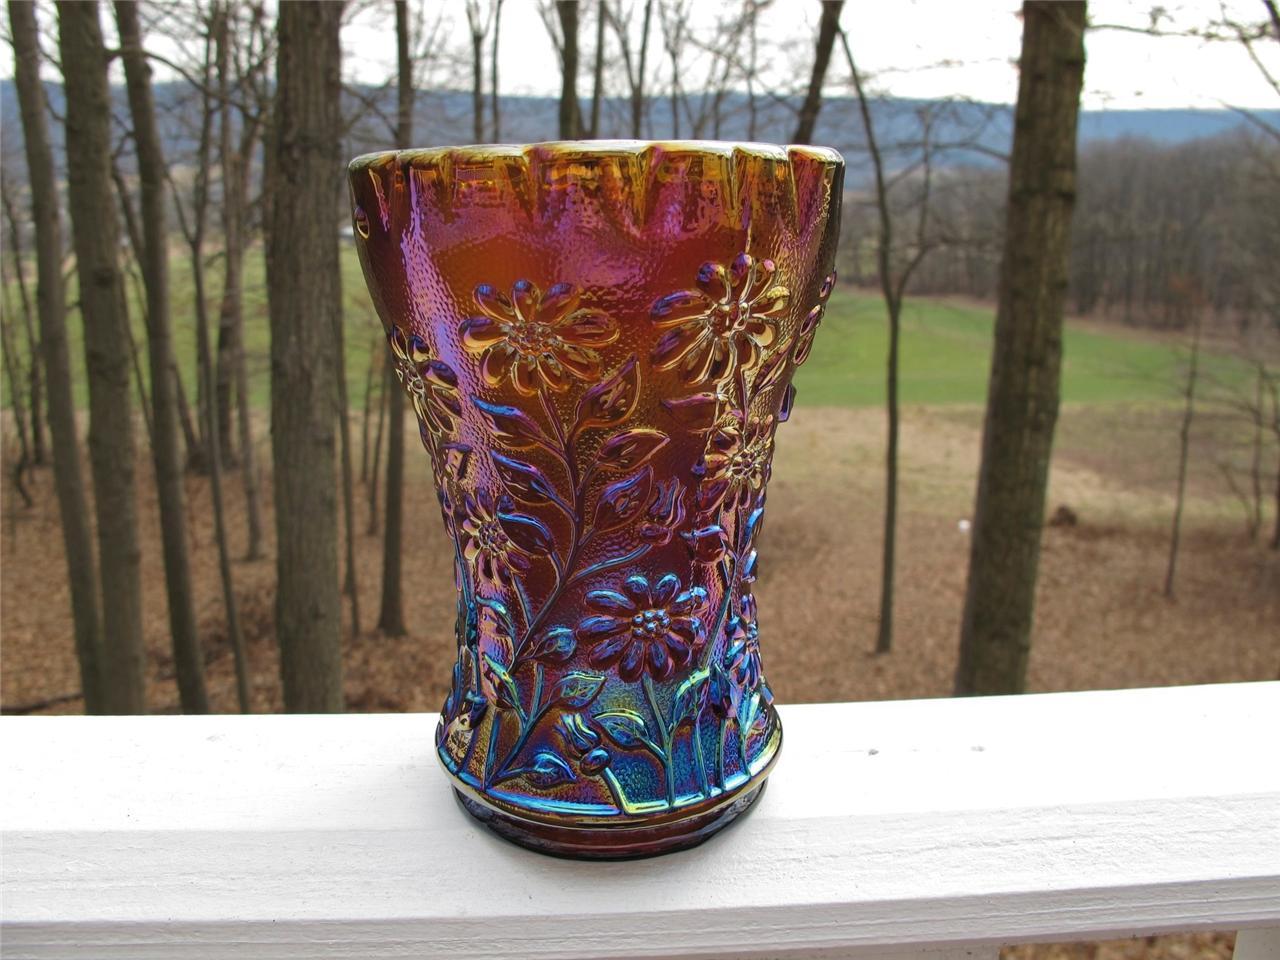 Imperial Amber Daisy Carnival Glass Whimsy Vase  Carnival